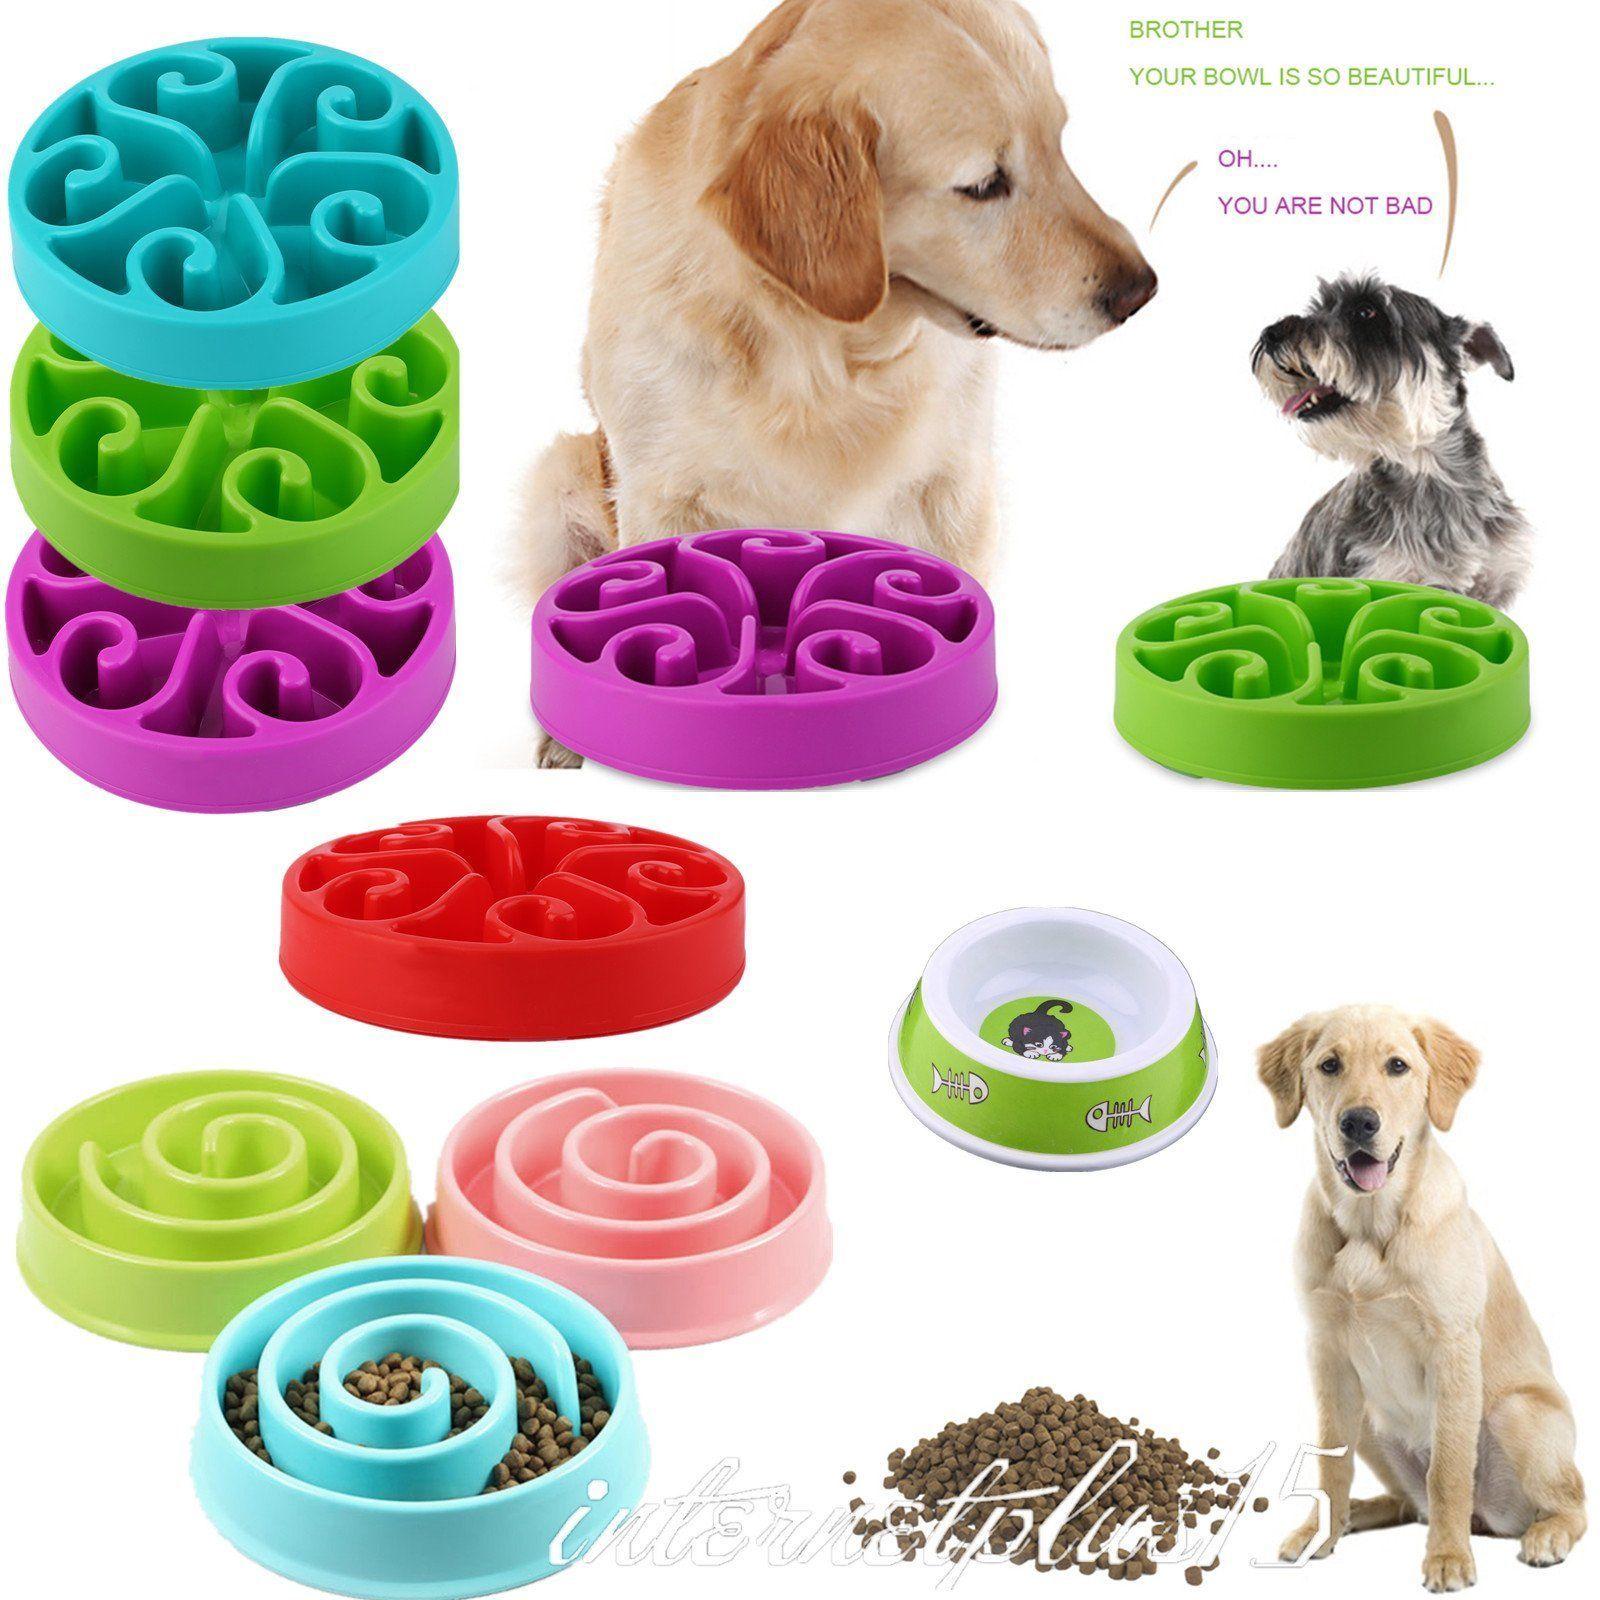 8 09 Aud Dog Food Bowl Healthy Anti Choke Bowl Feeder Pet